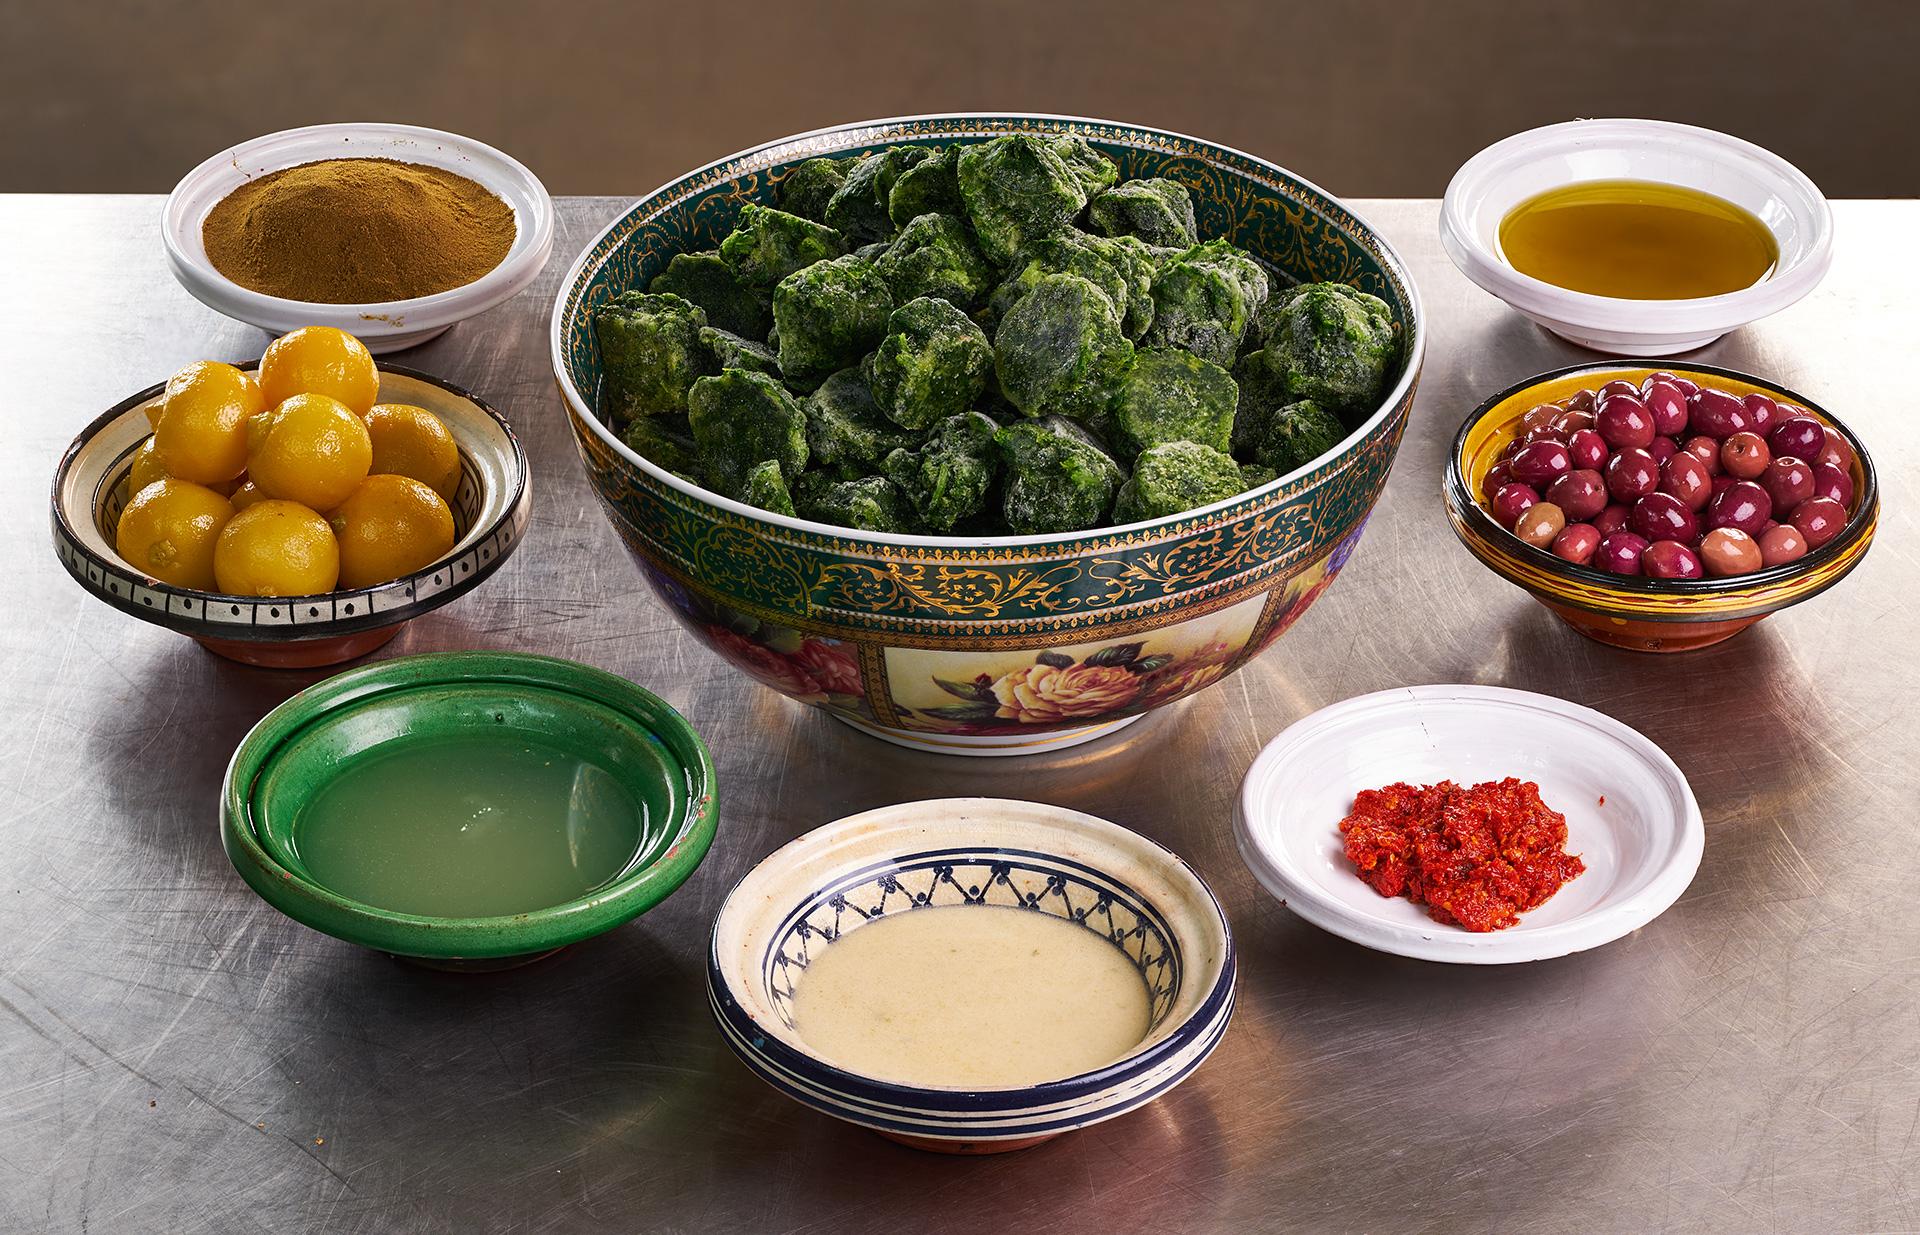 Салат-из-шпината-ингредиенты.jpg